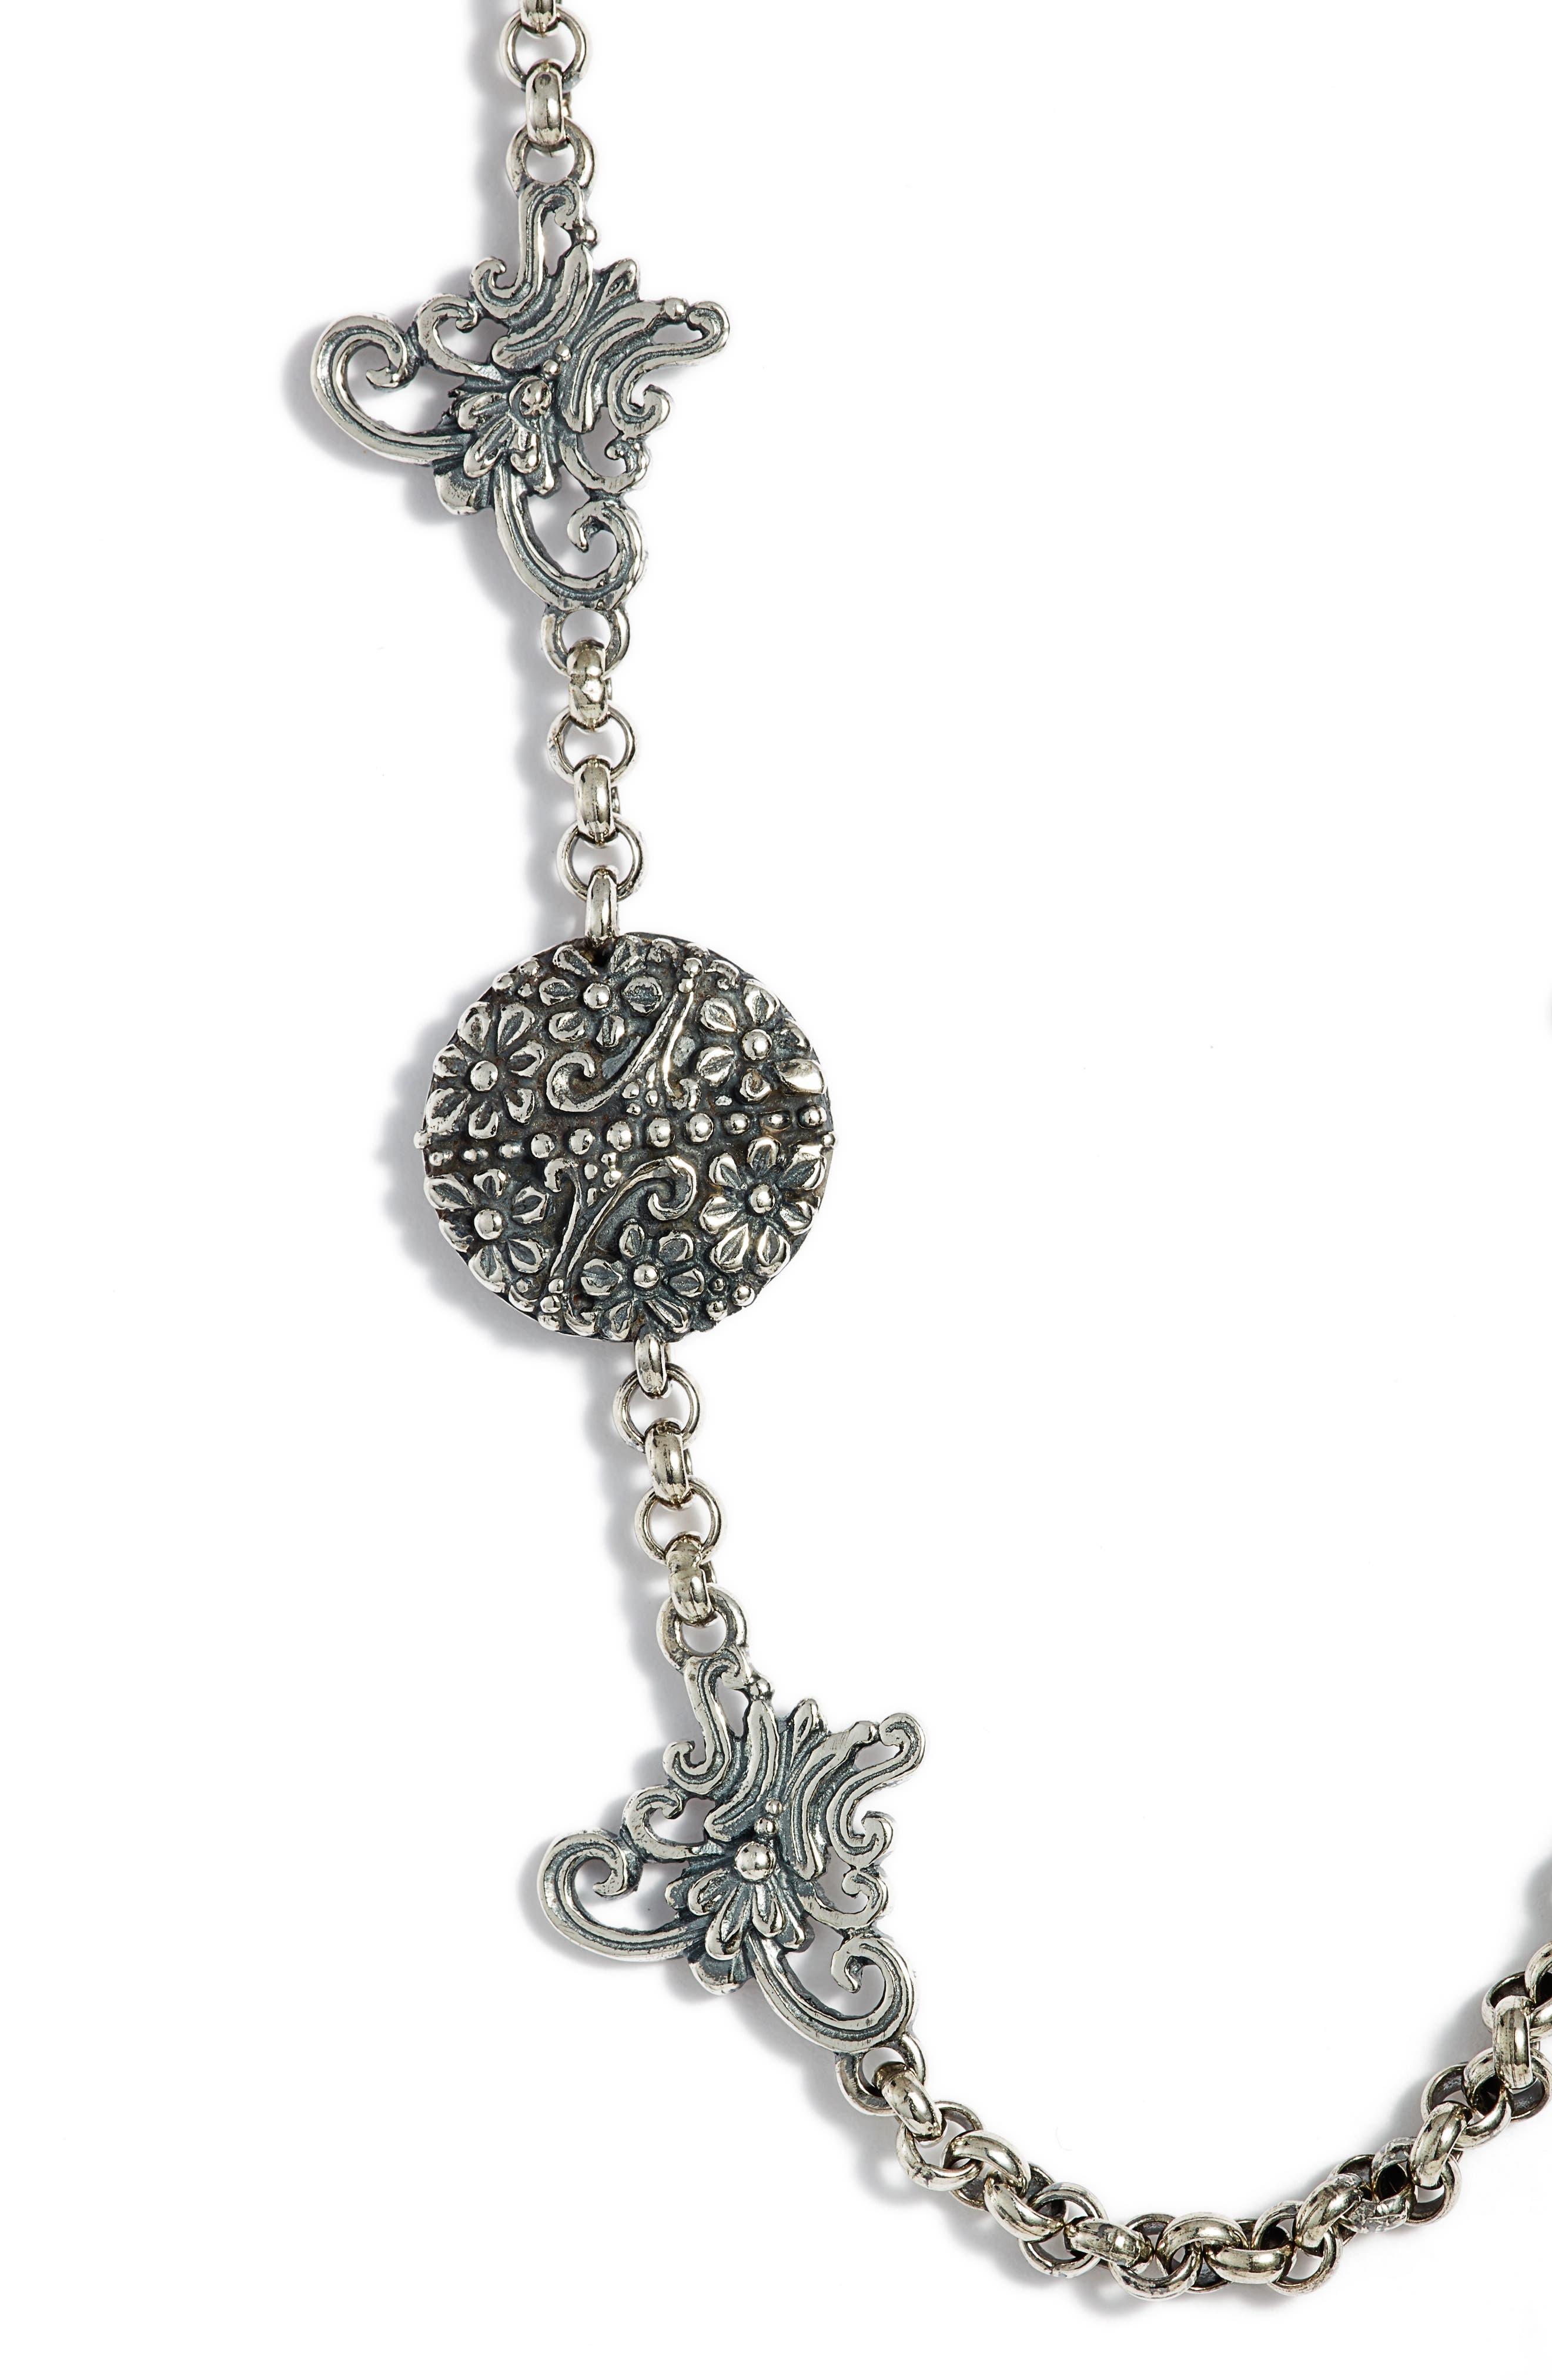 Santorini Butterfly Collar Necklace,                             Alternate thumbnail 2, color,                             Silver/ Hematite